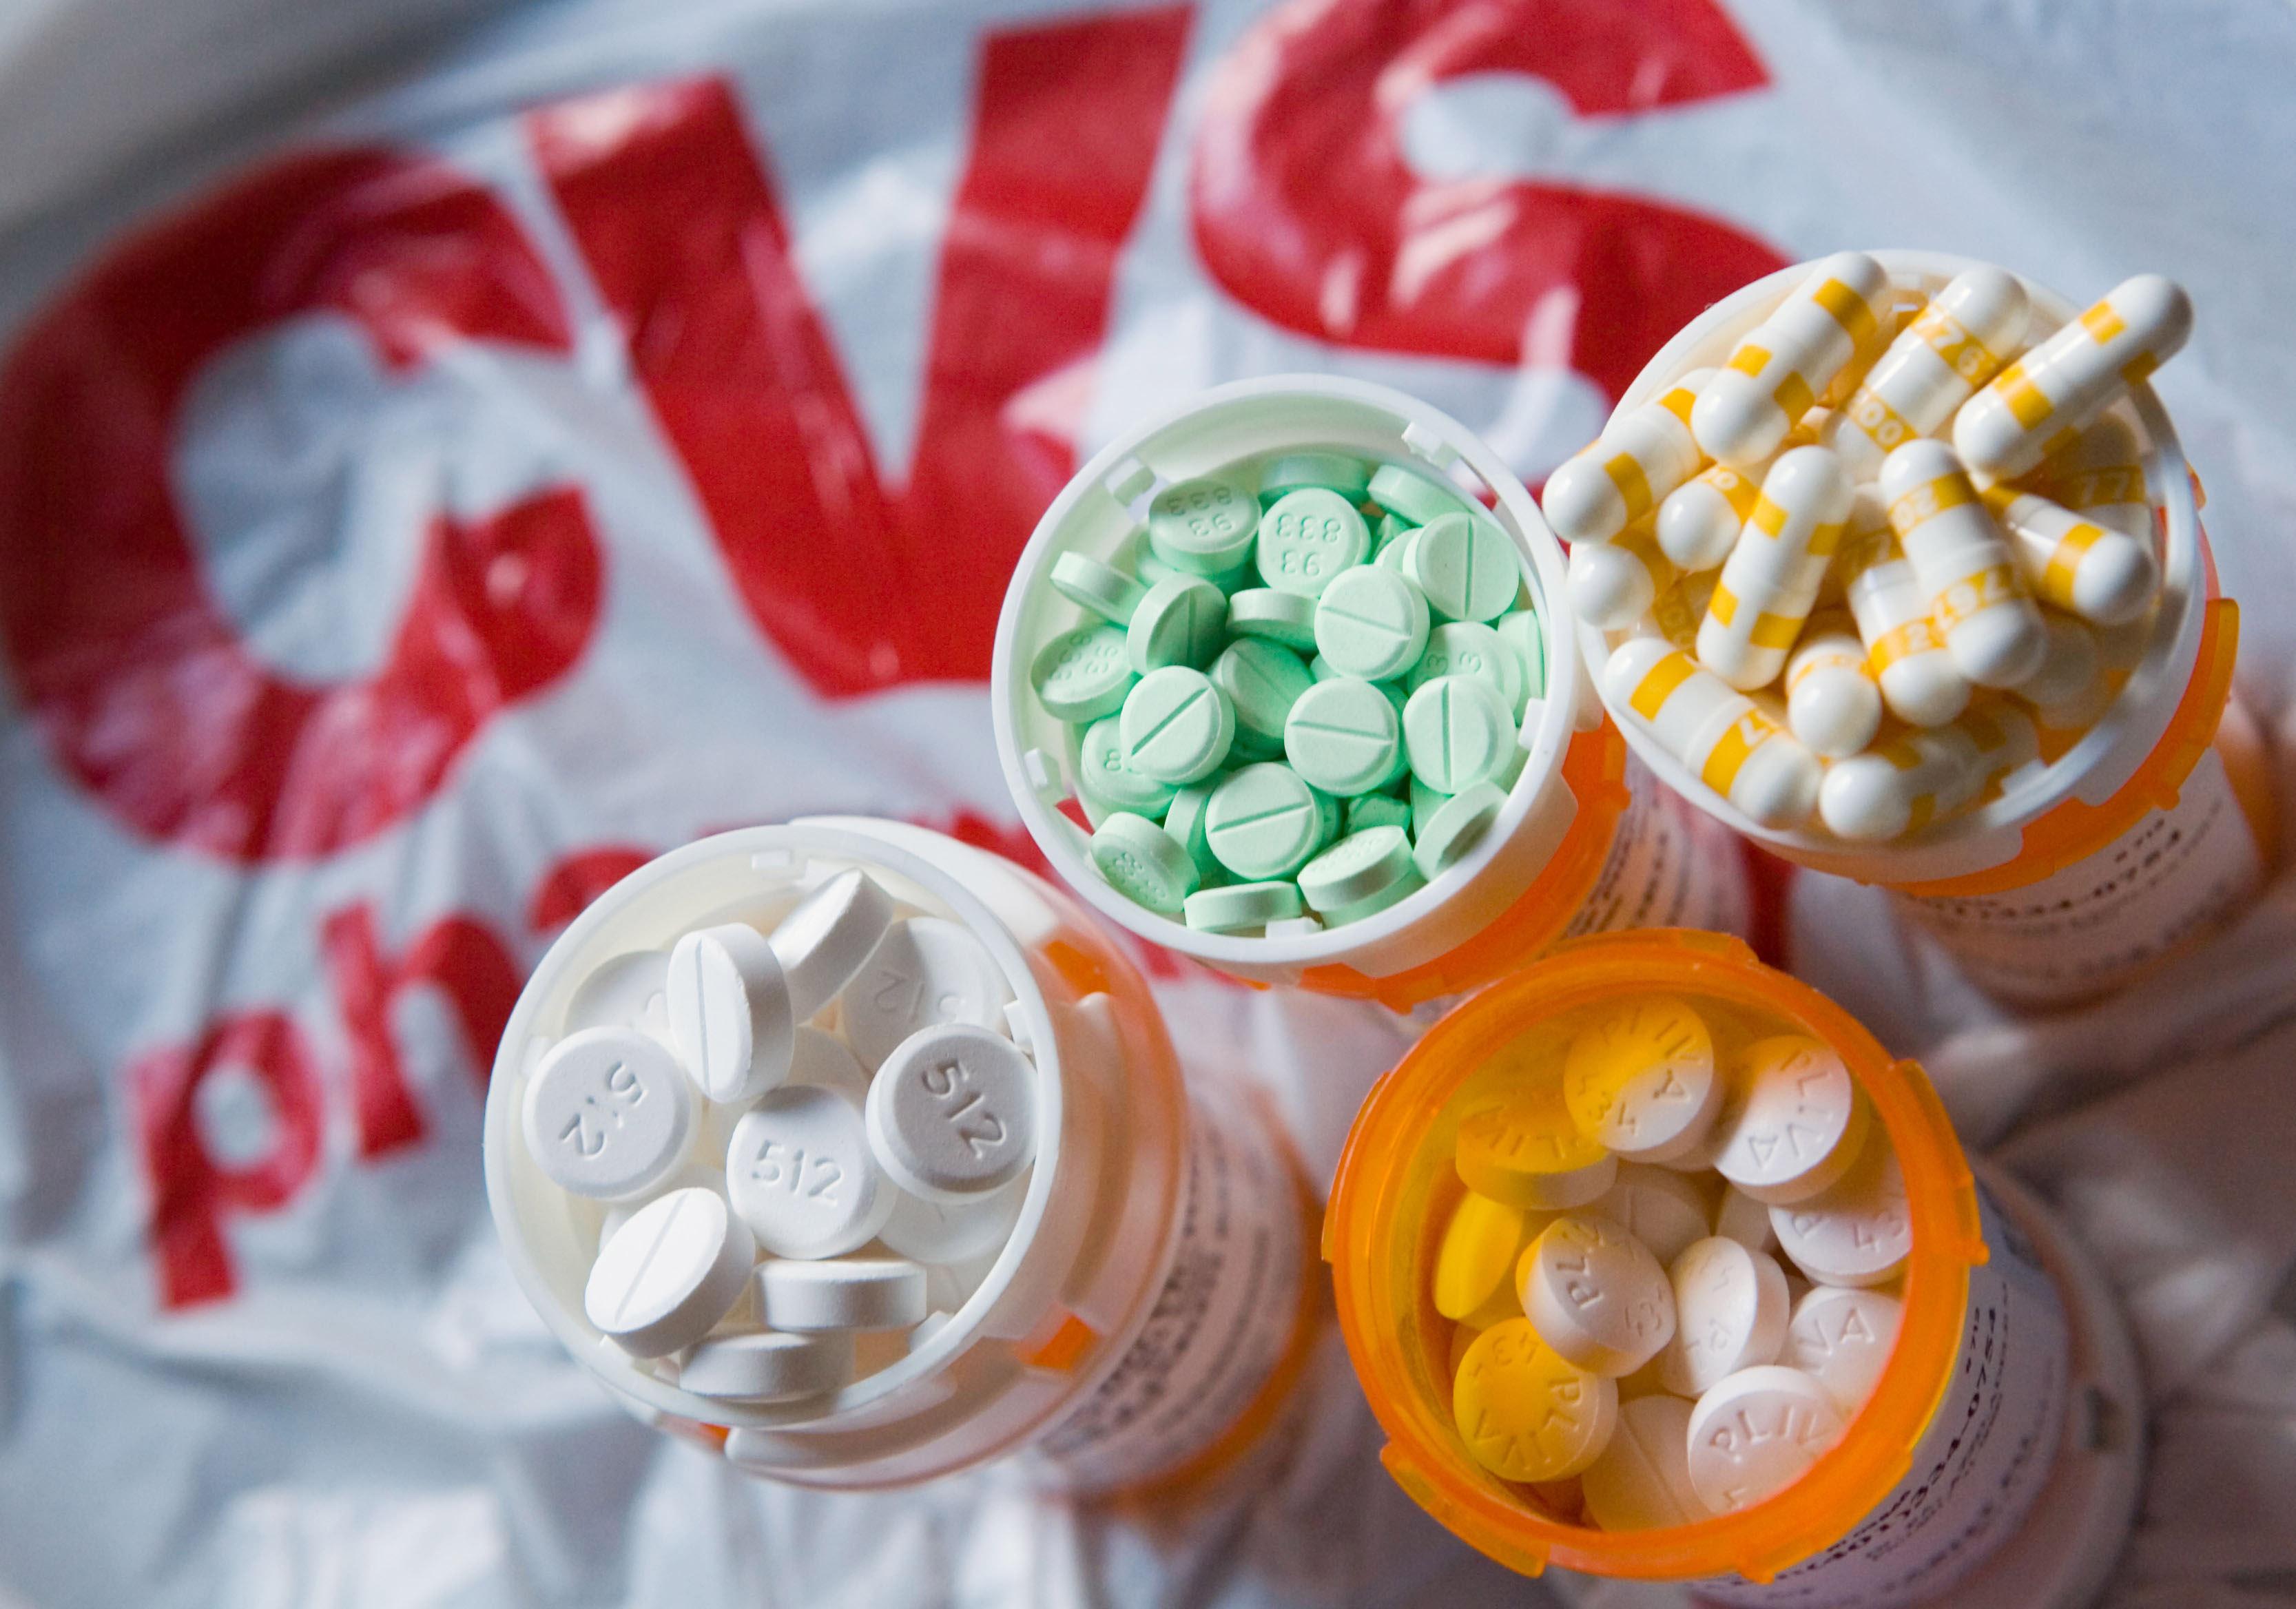 Prescription medication frames the CVS logo.